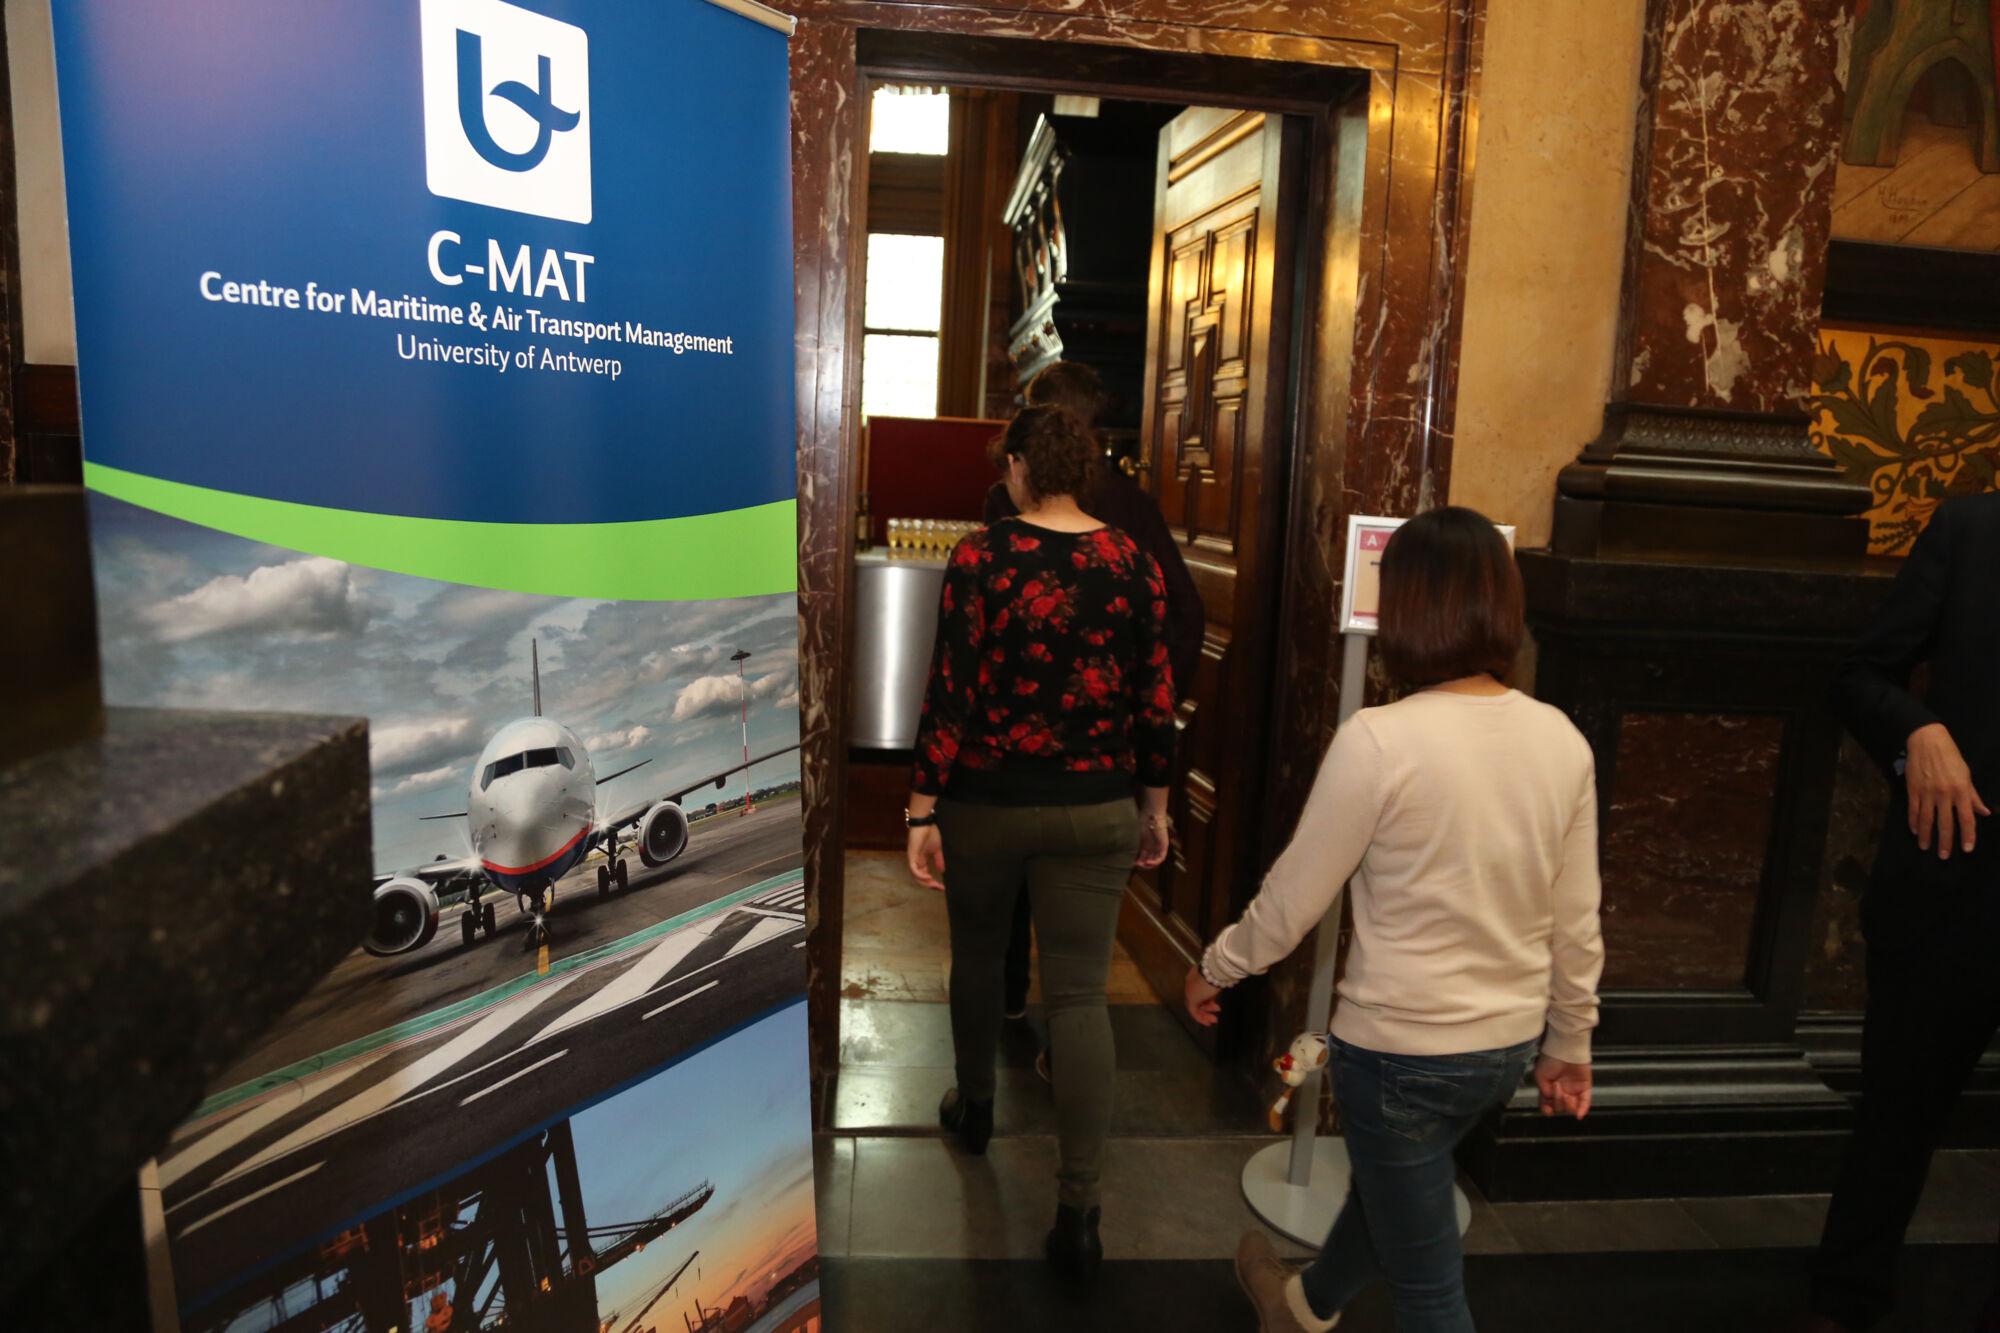 C-MAT Opening 2015